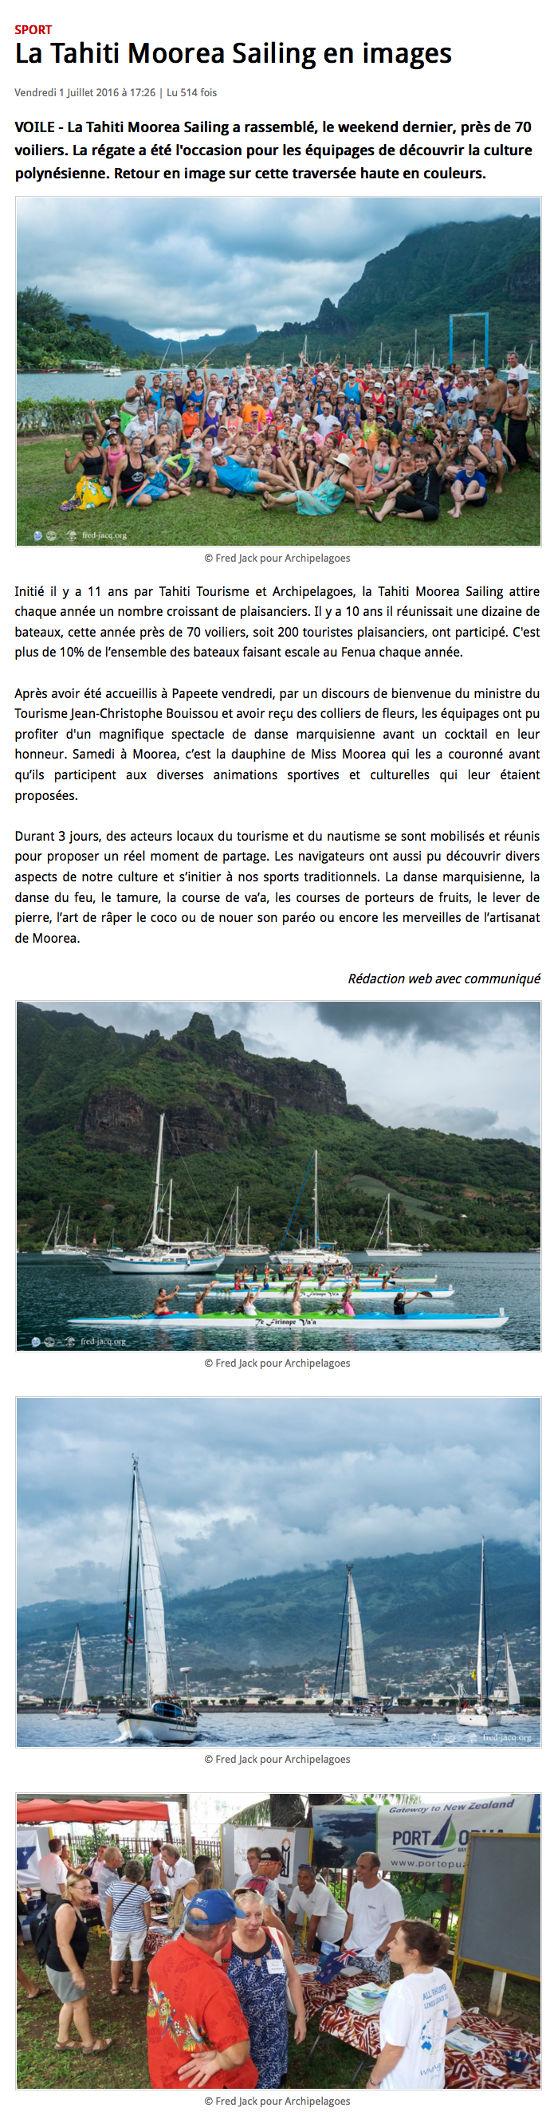 La_Tahiti_Moorea_Sailing_en_images_-_2016-07-05_14.54.15